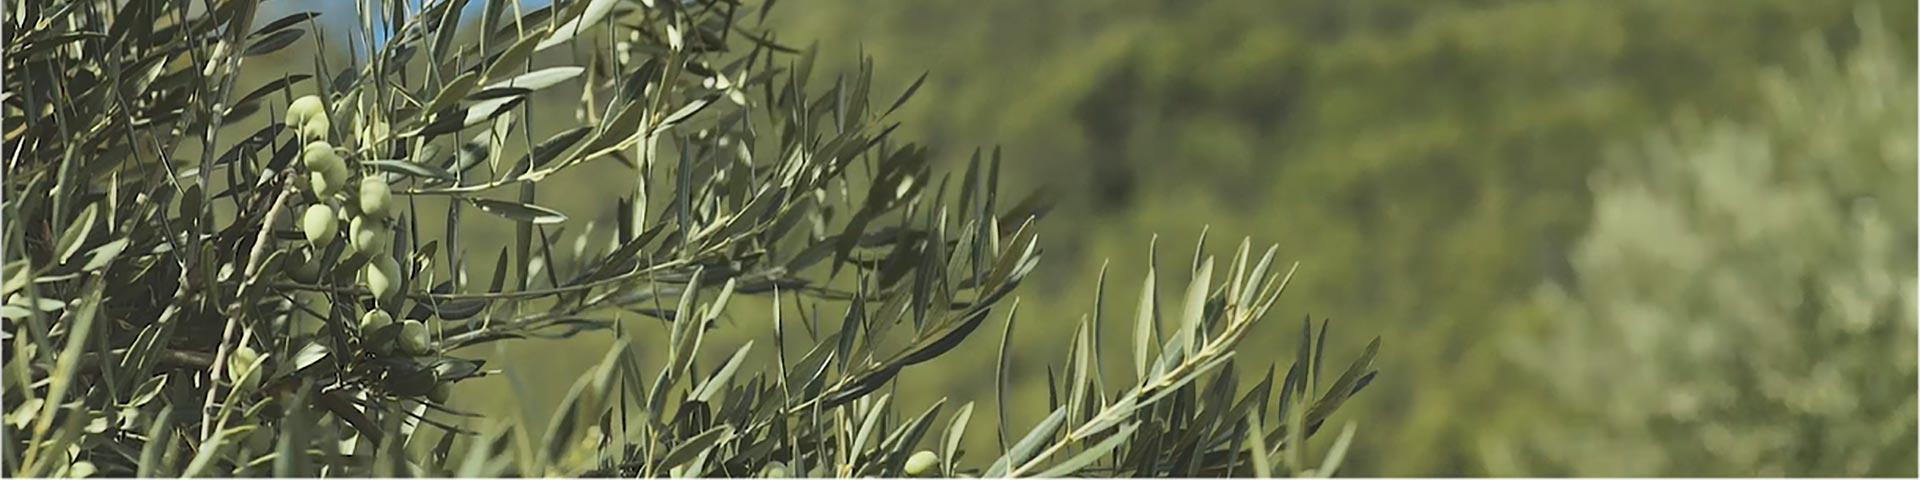 olivar-1